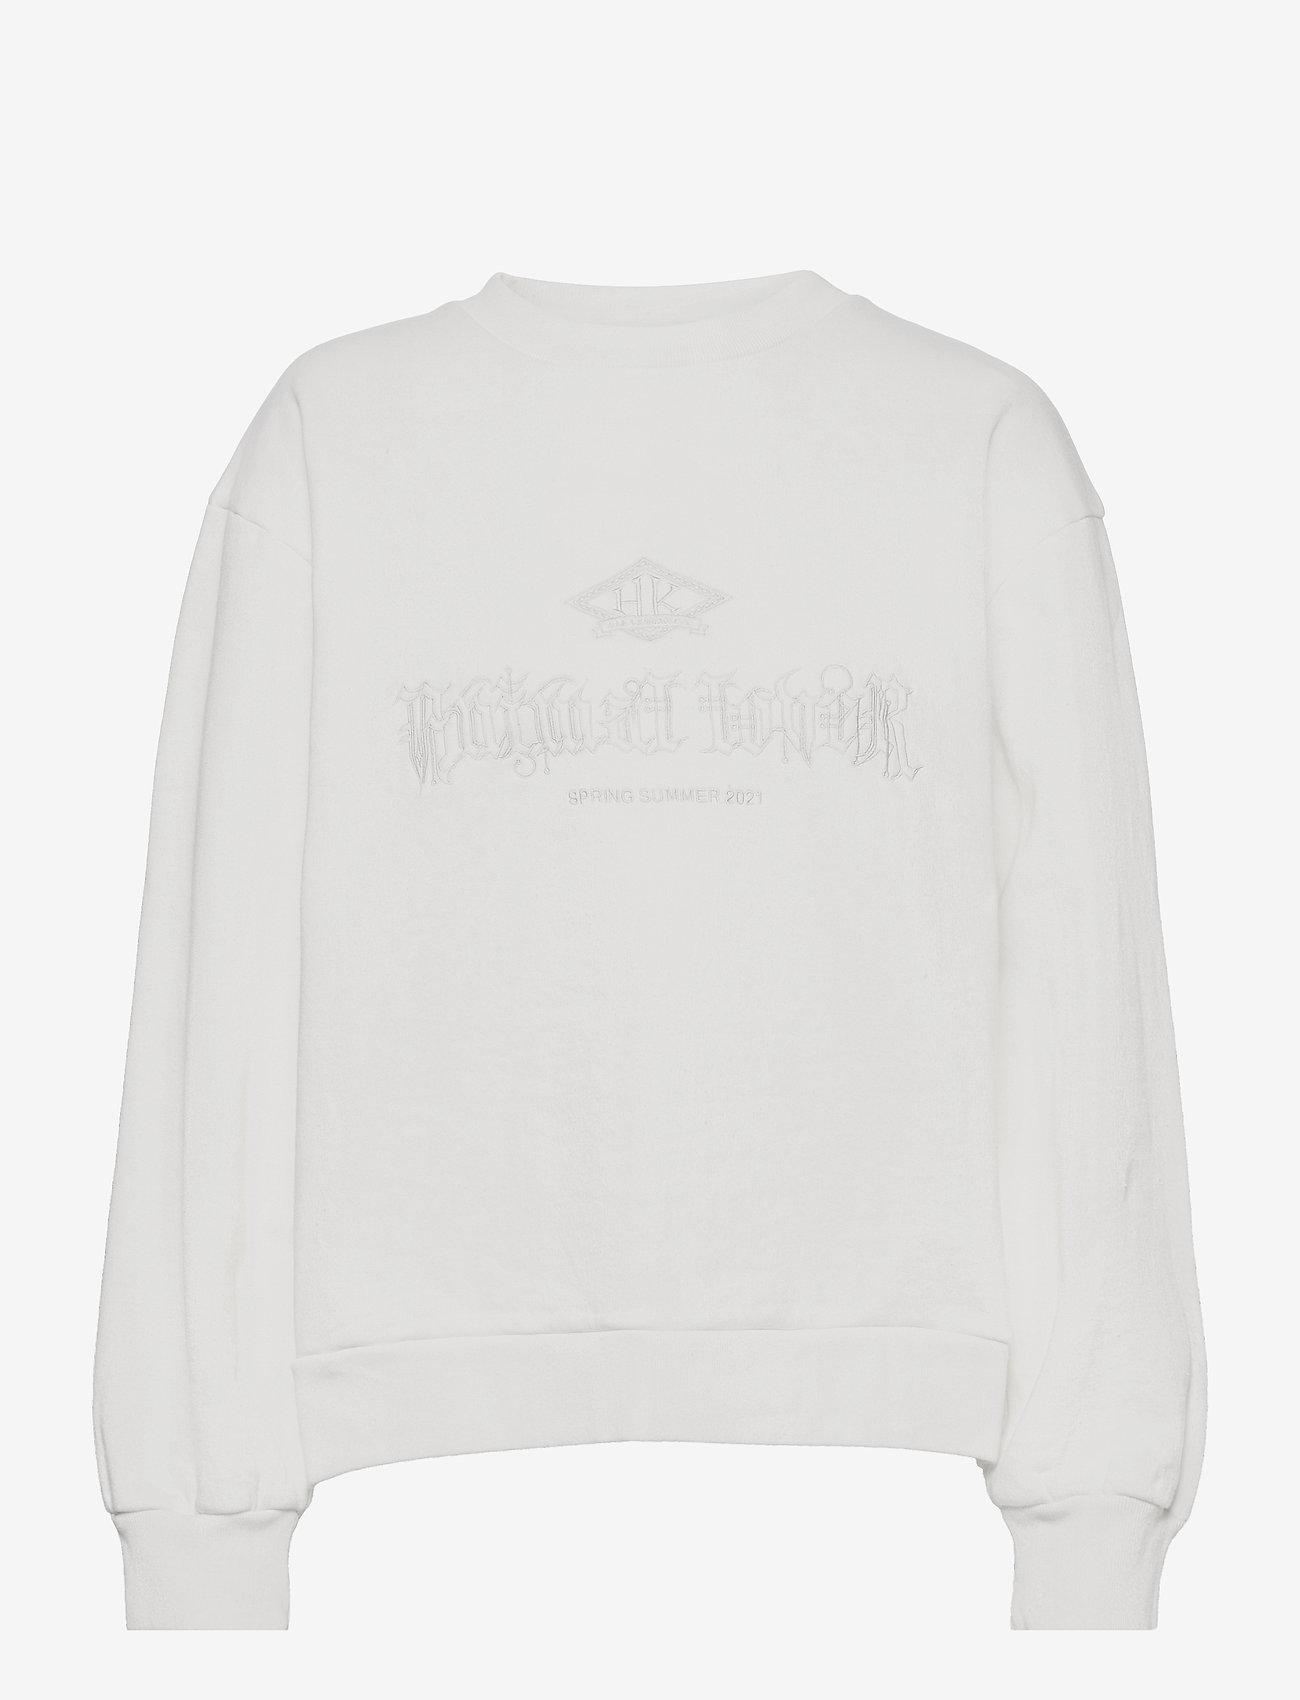 HAN Kjøbenhavn - Bulky Crew - sweatshirts - off white - 0